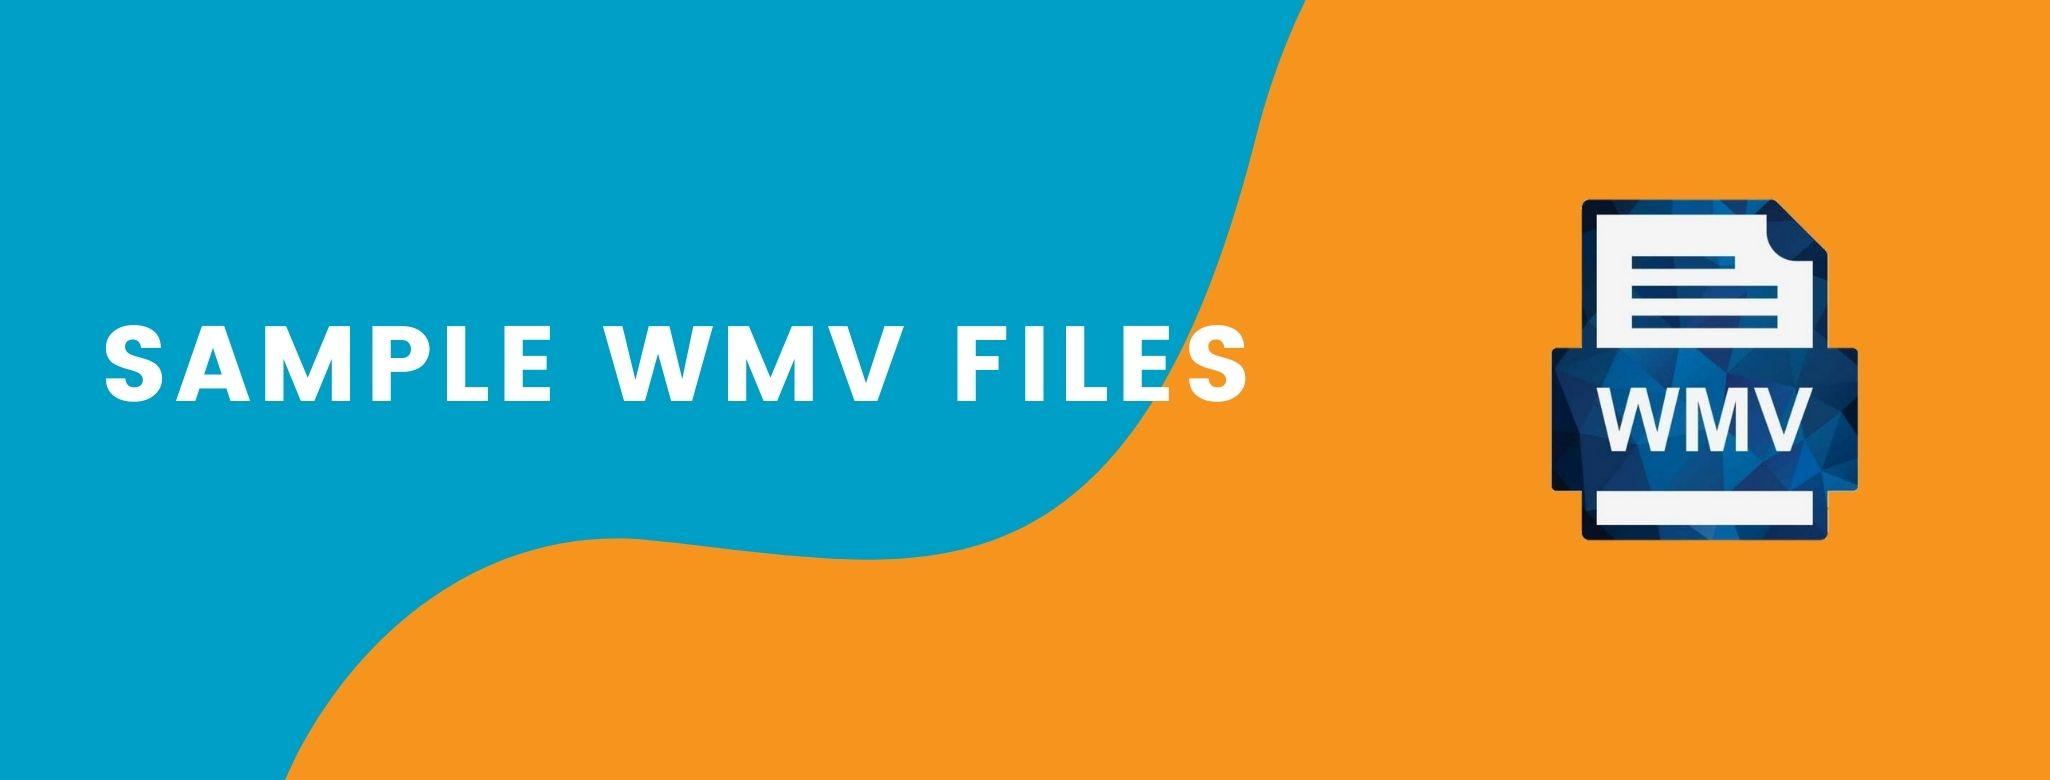 Sample WMV Files